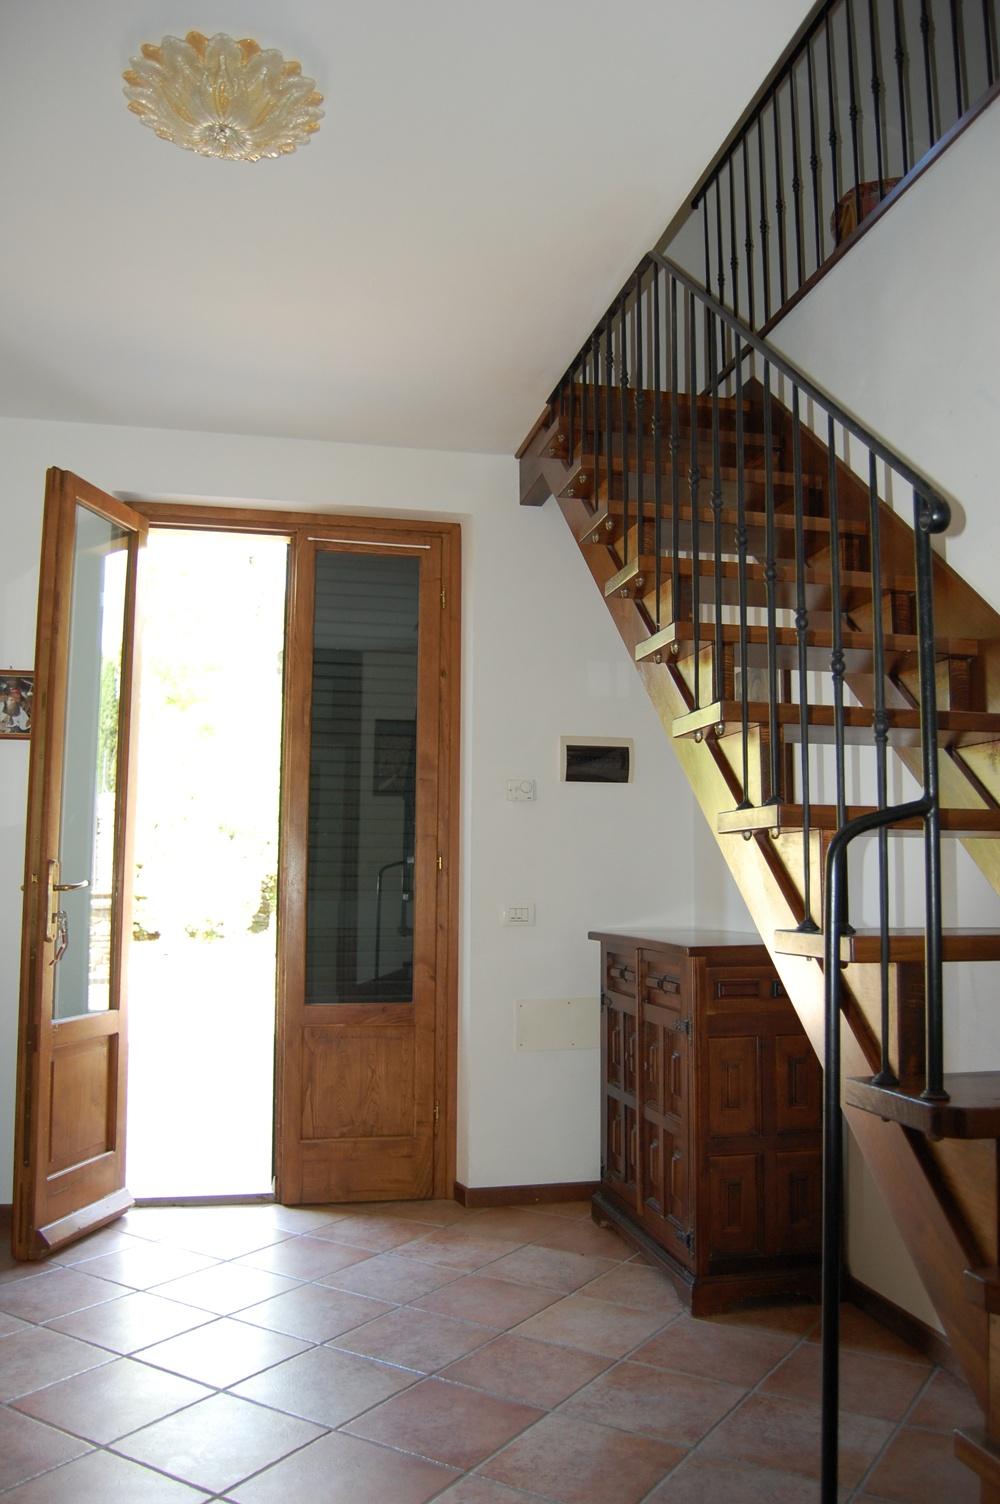 3 Bed Short Term Rental House cortona